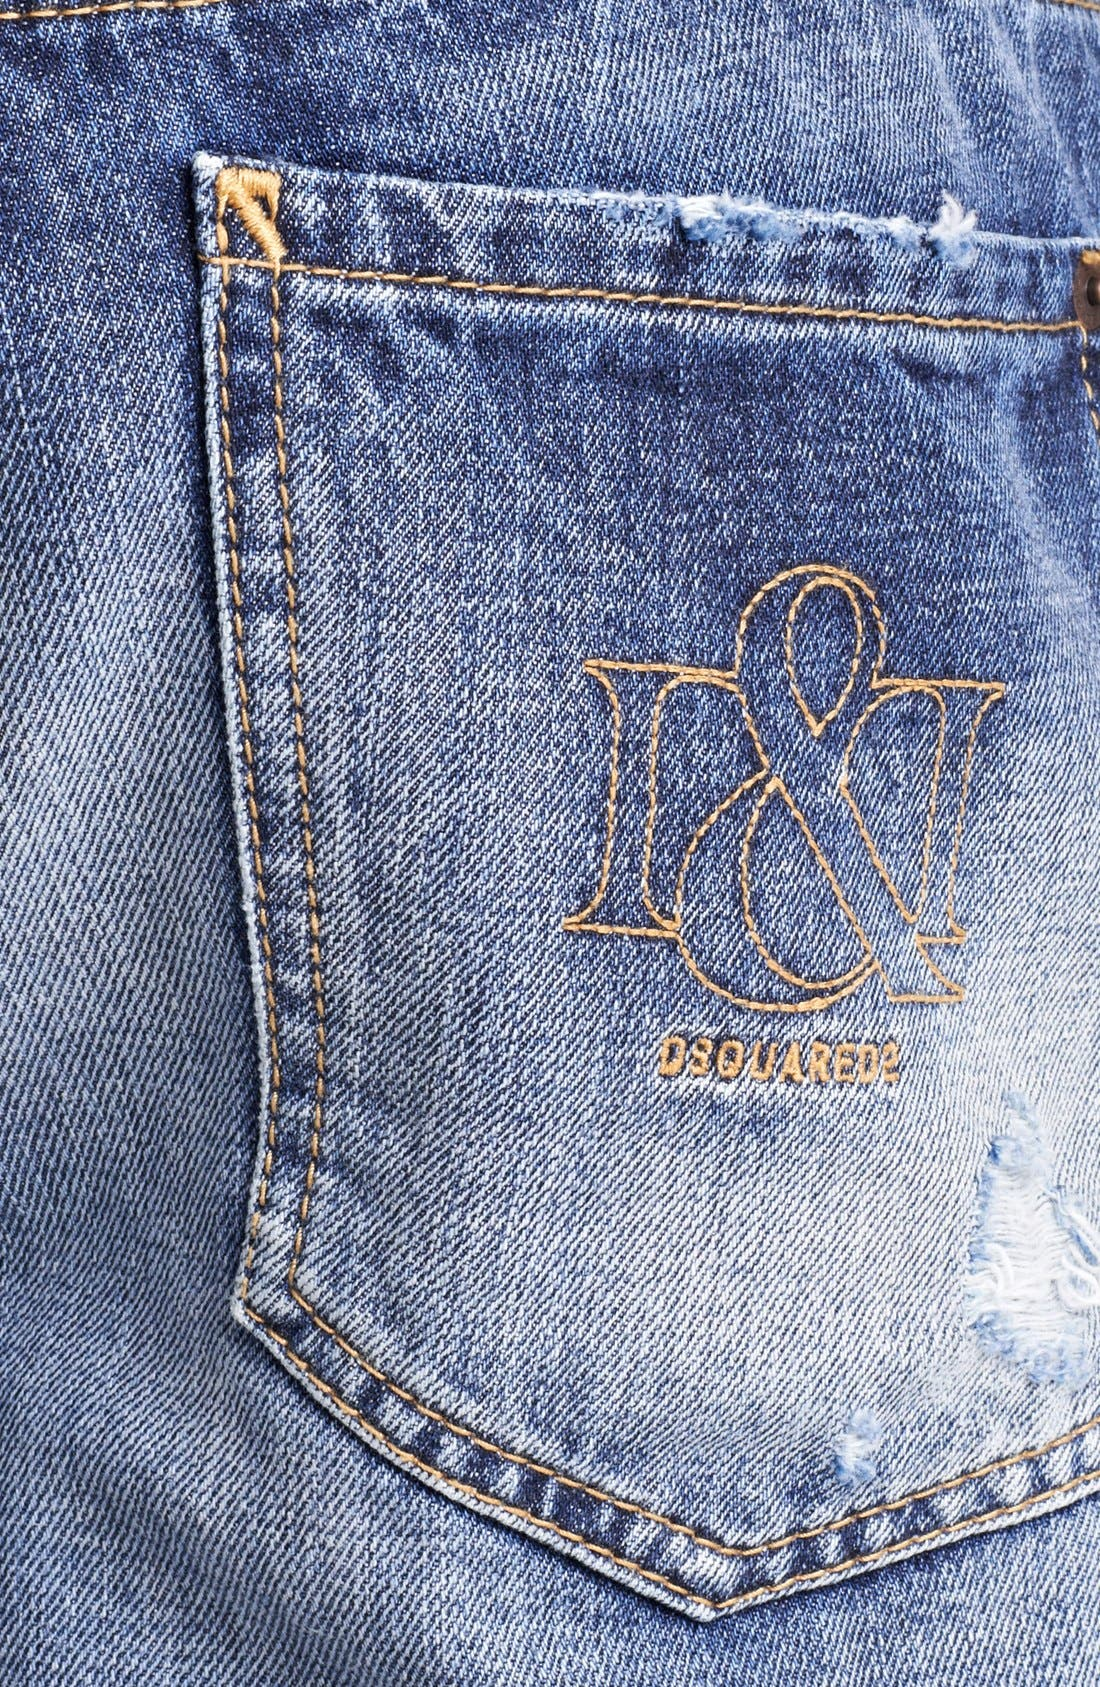 Alternate Image 4  - Dsquared2 'Dean' Slim Fit Jeans (Distressed Blue)